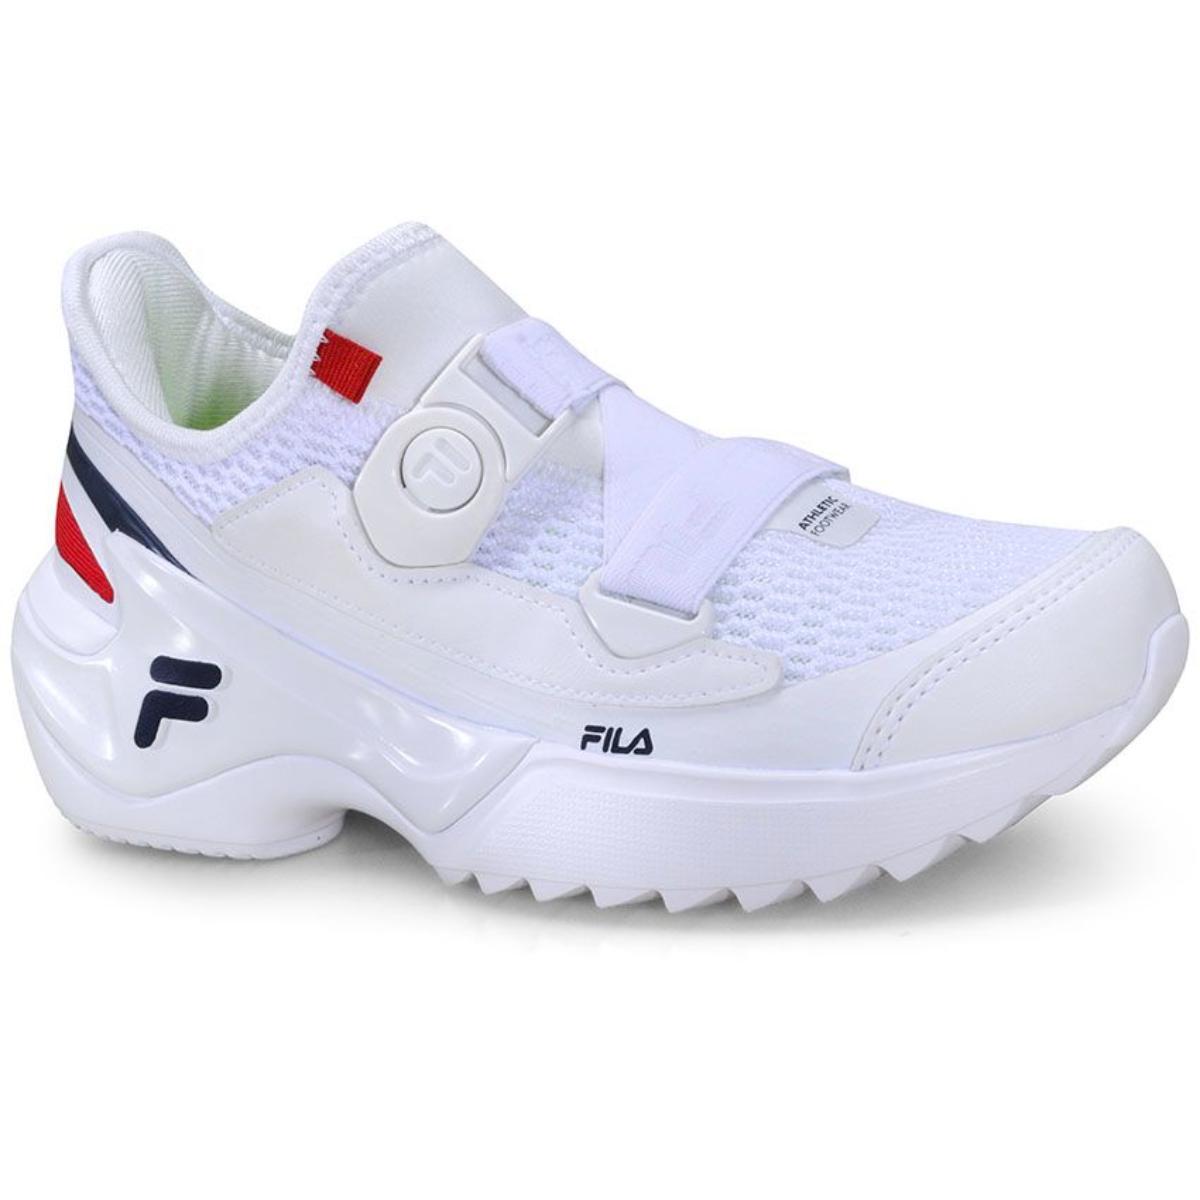 Tênis Feminino Fila F02st004068 156 F-loop Branco